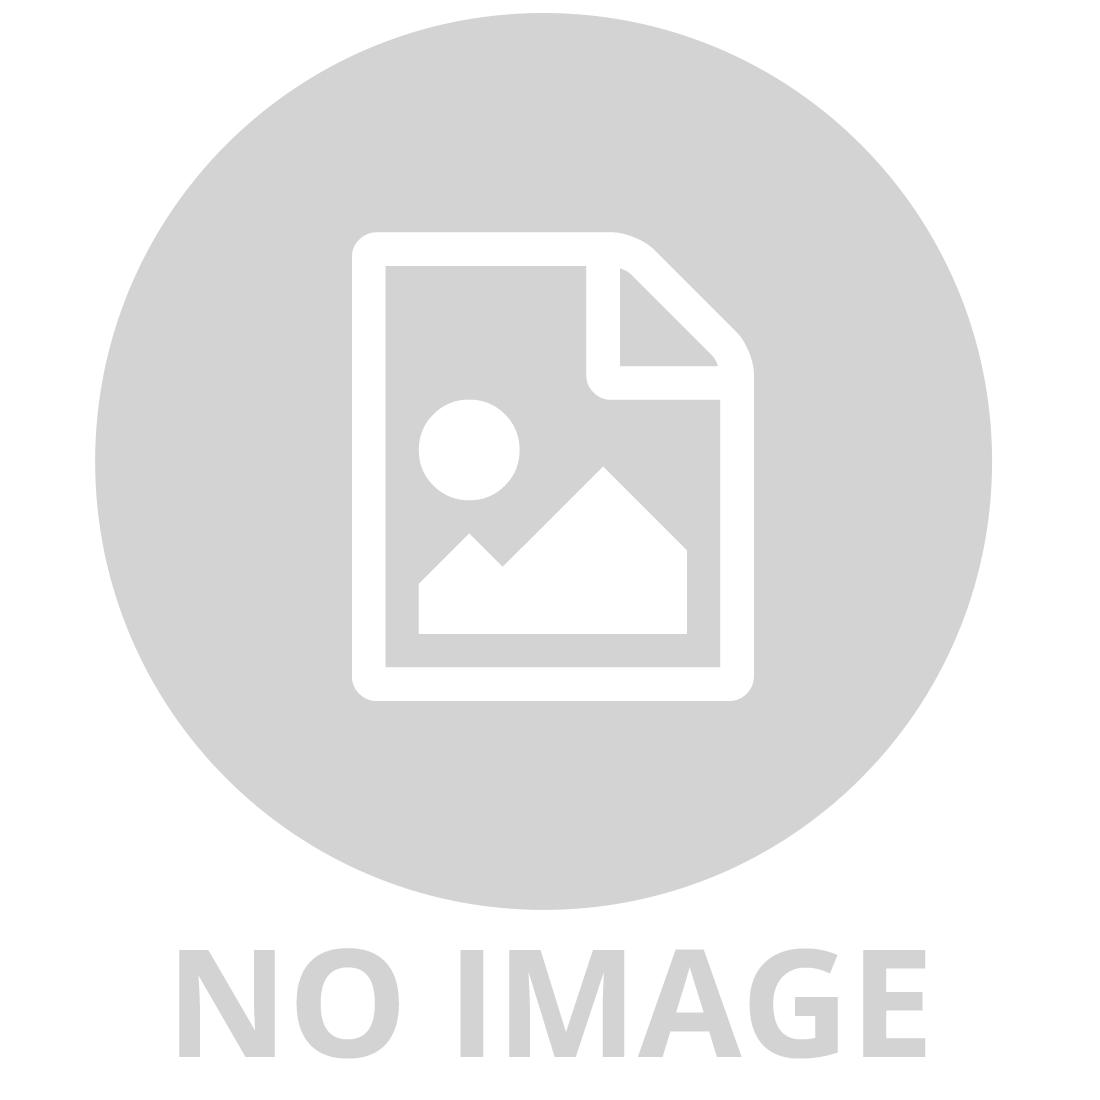 BEANIE BOOS REGULAR BUZBY YELLOW BEE